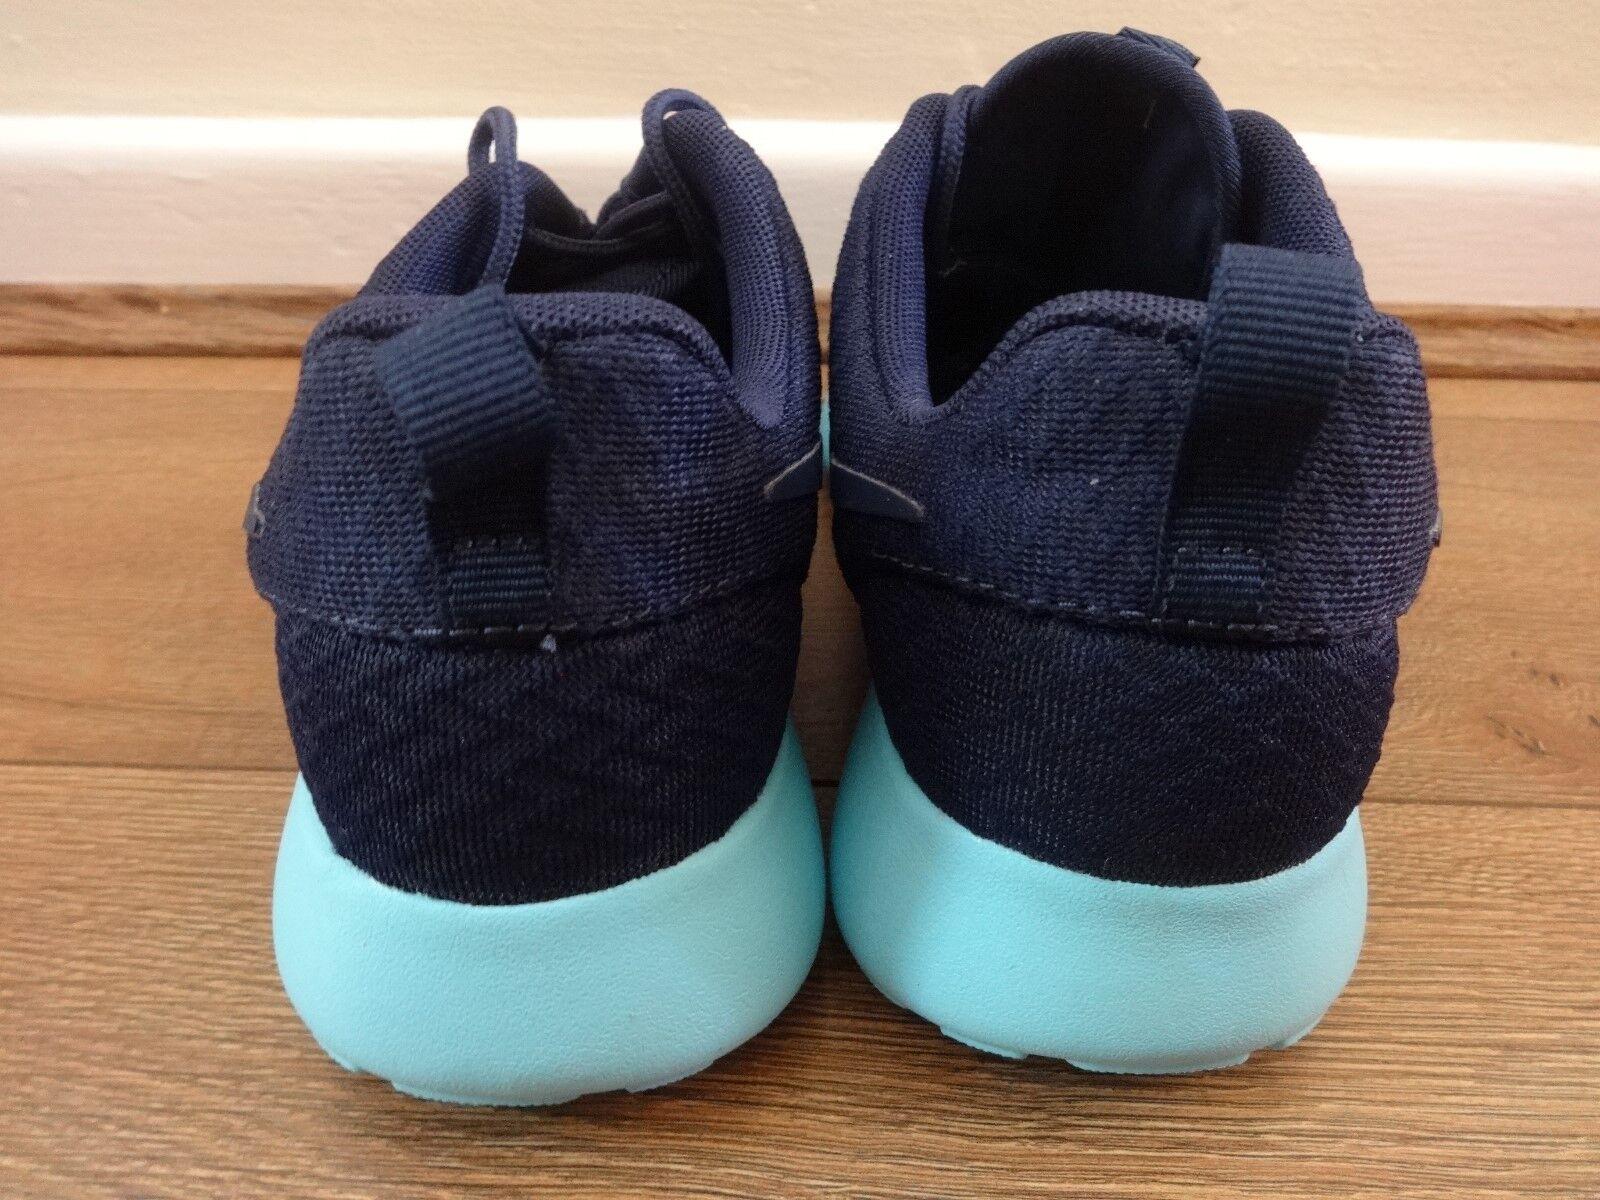 Nike Roshe One Femme trainers Baskets eu 511882 444 uk 4 eu Baskets 37.5 us 6.5 NEWBOX 6bdcc2